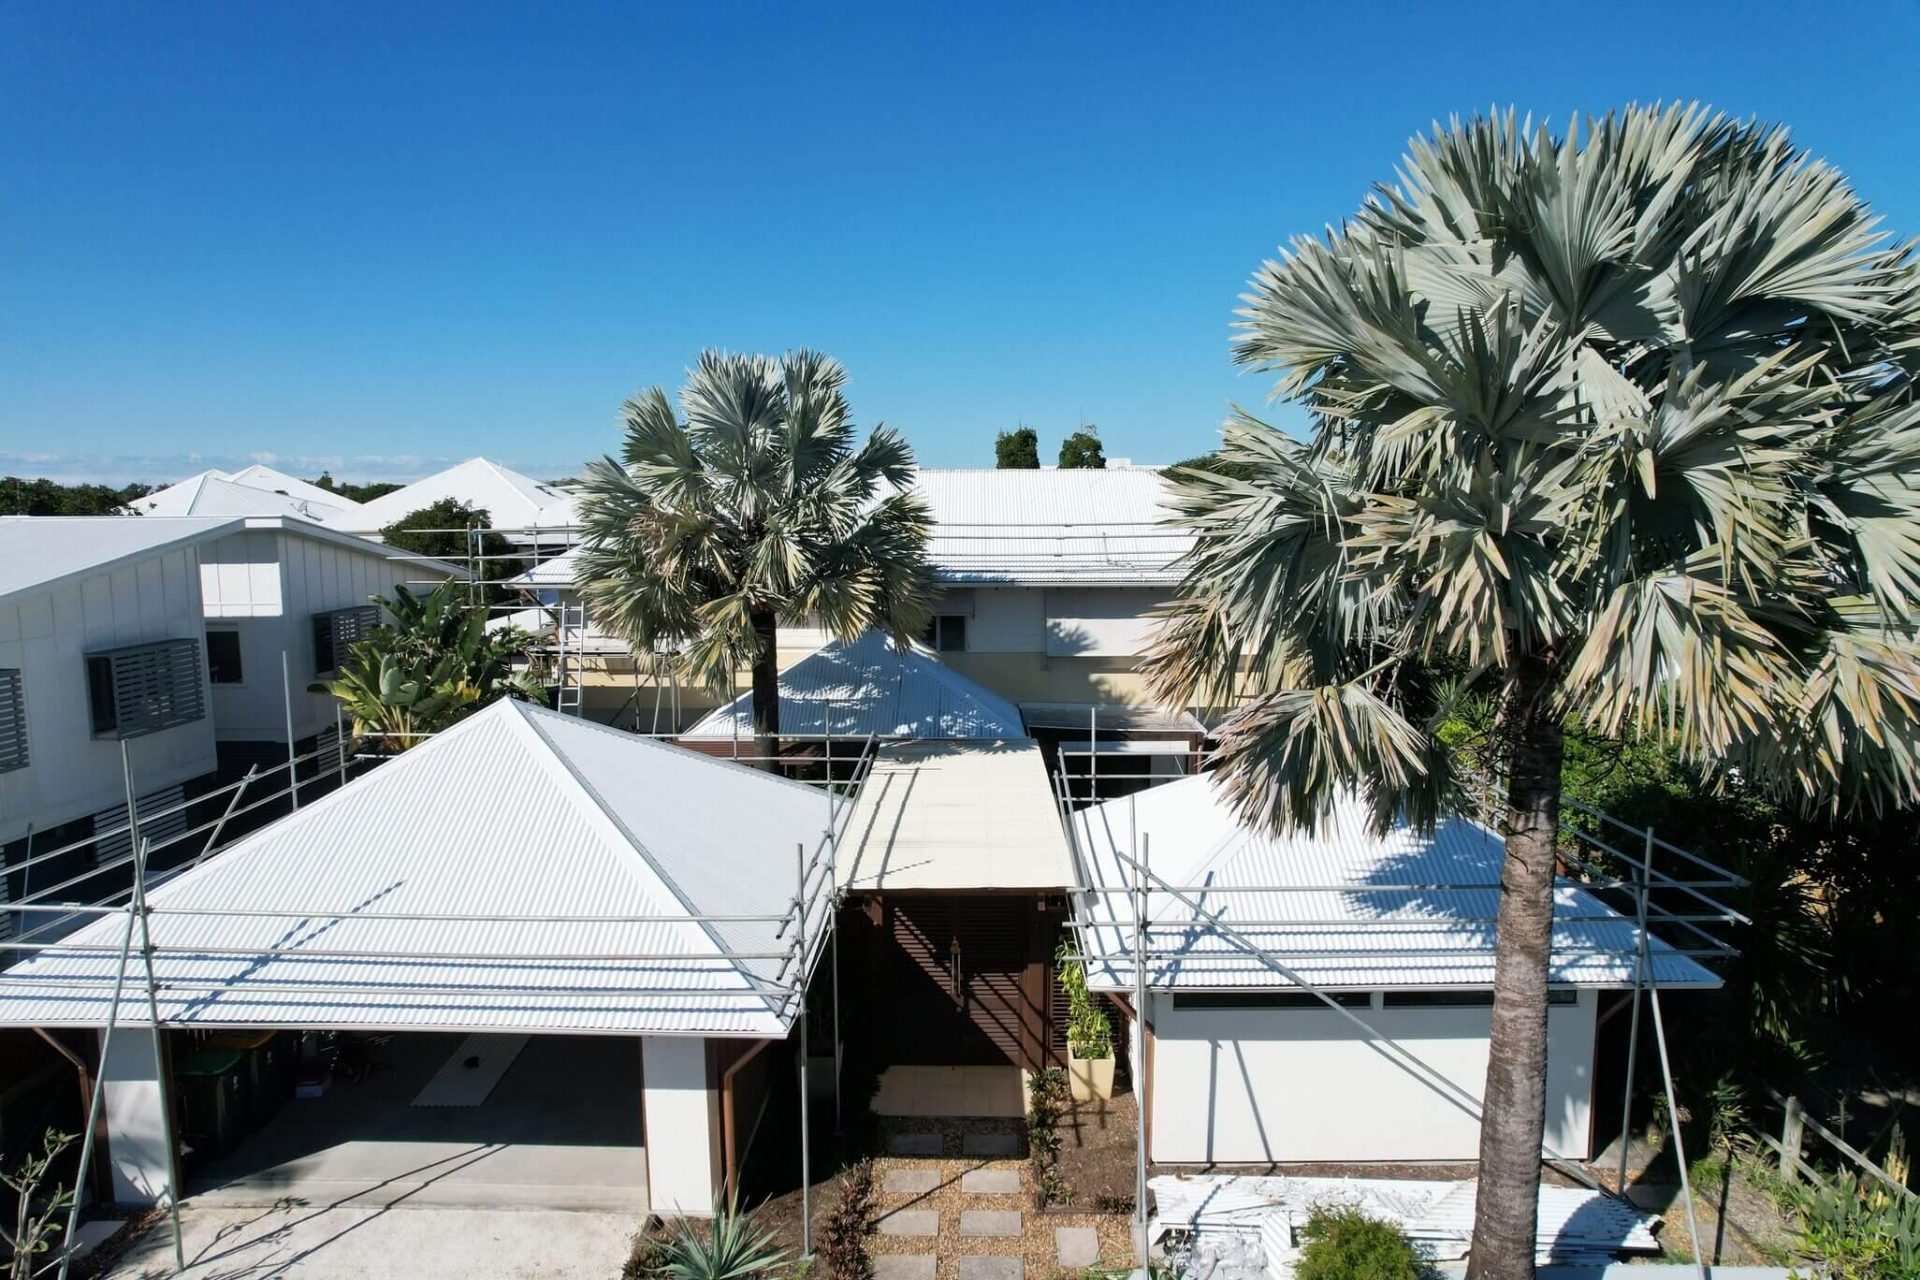 Master Roofing Australia